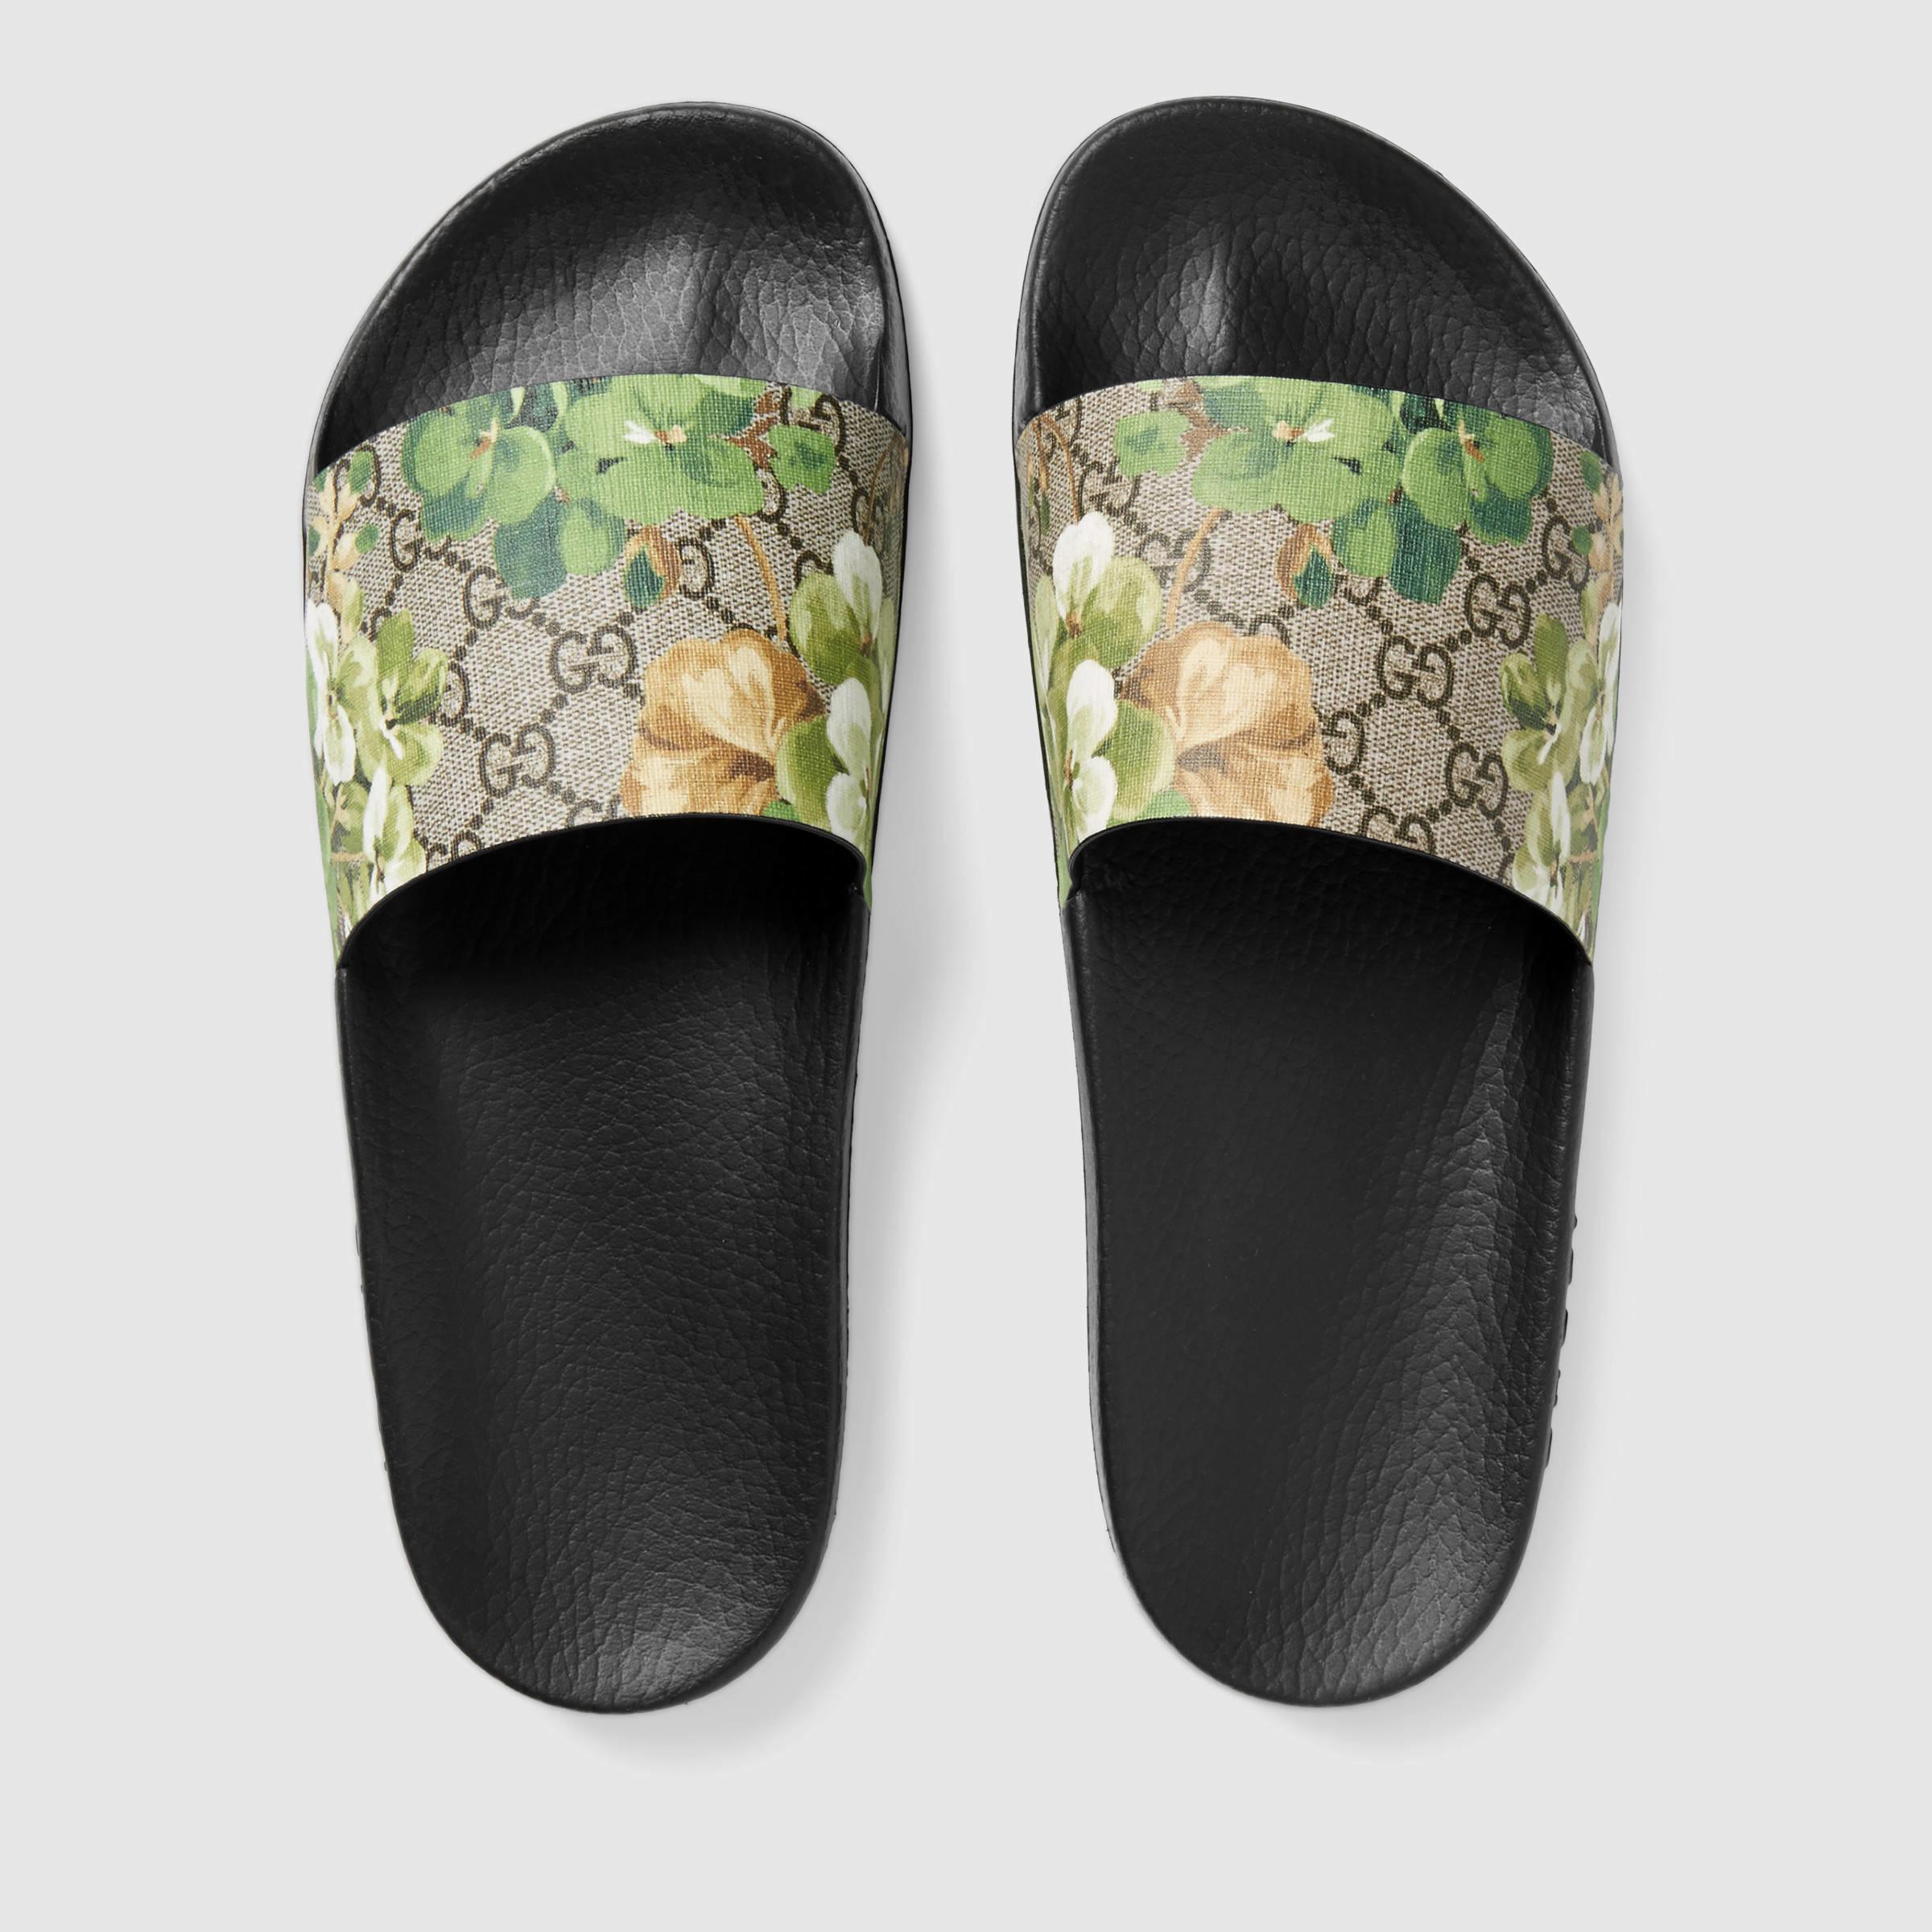 26b418b50be Lyst - Gucci Blooms Print Sandal